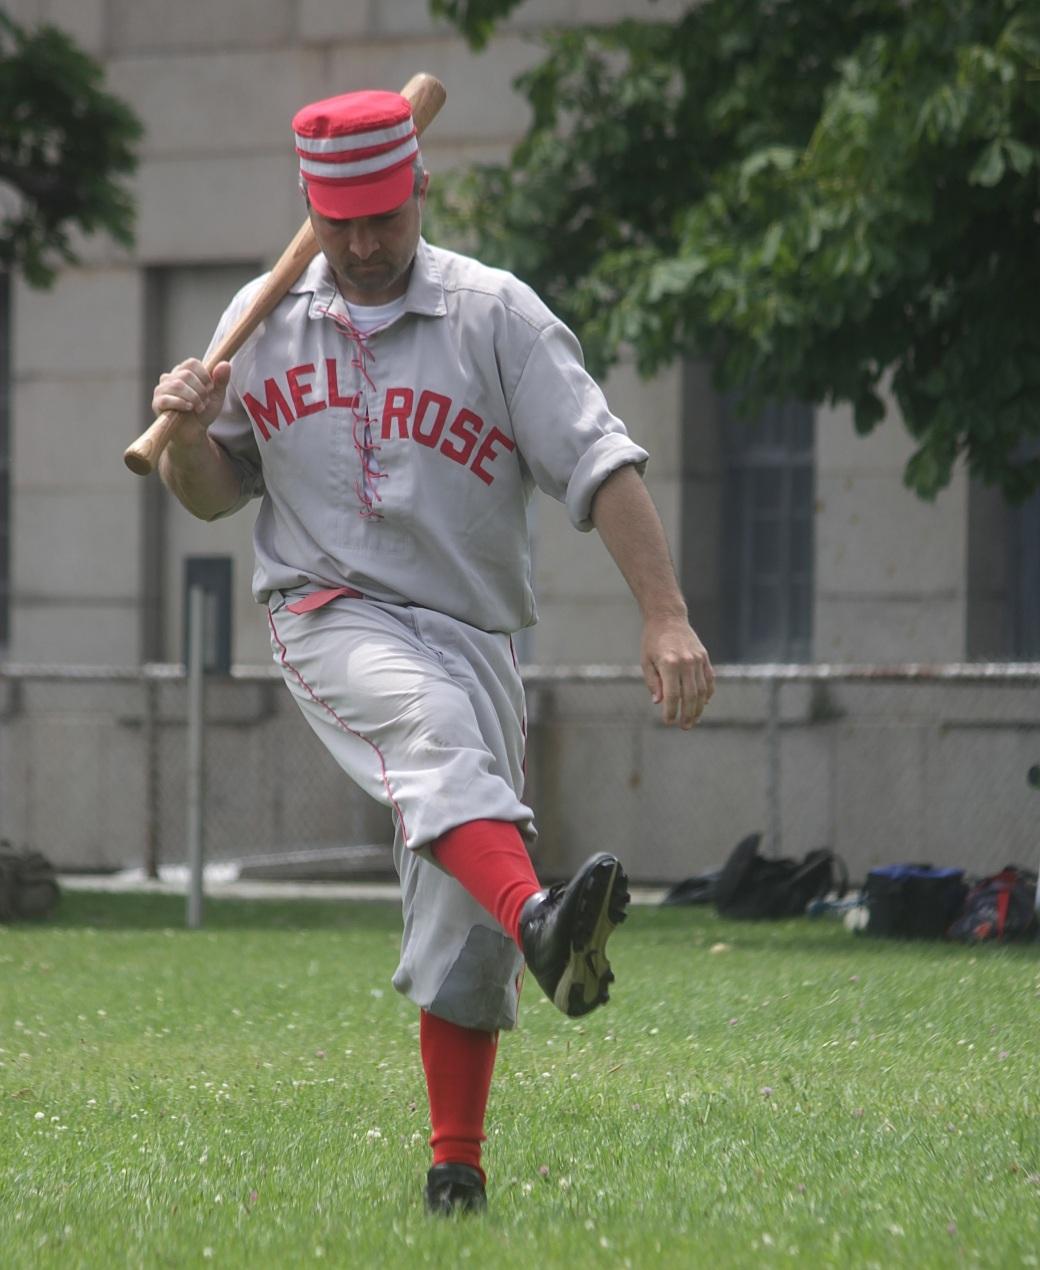 boston george's island vintage baseball june 30 new hampshire granites melrose